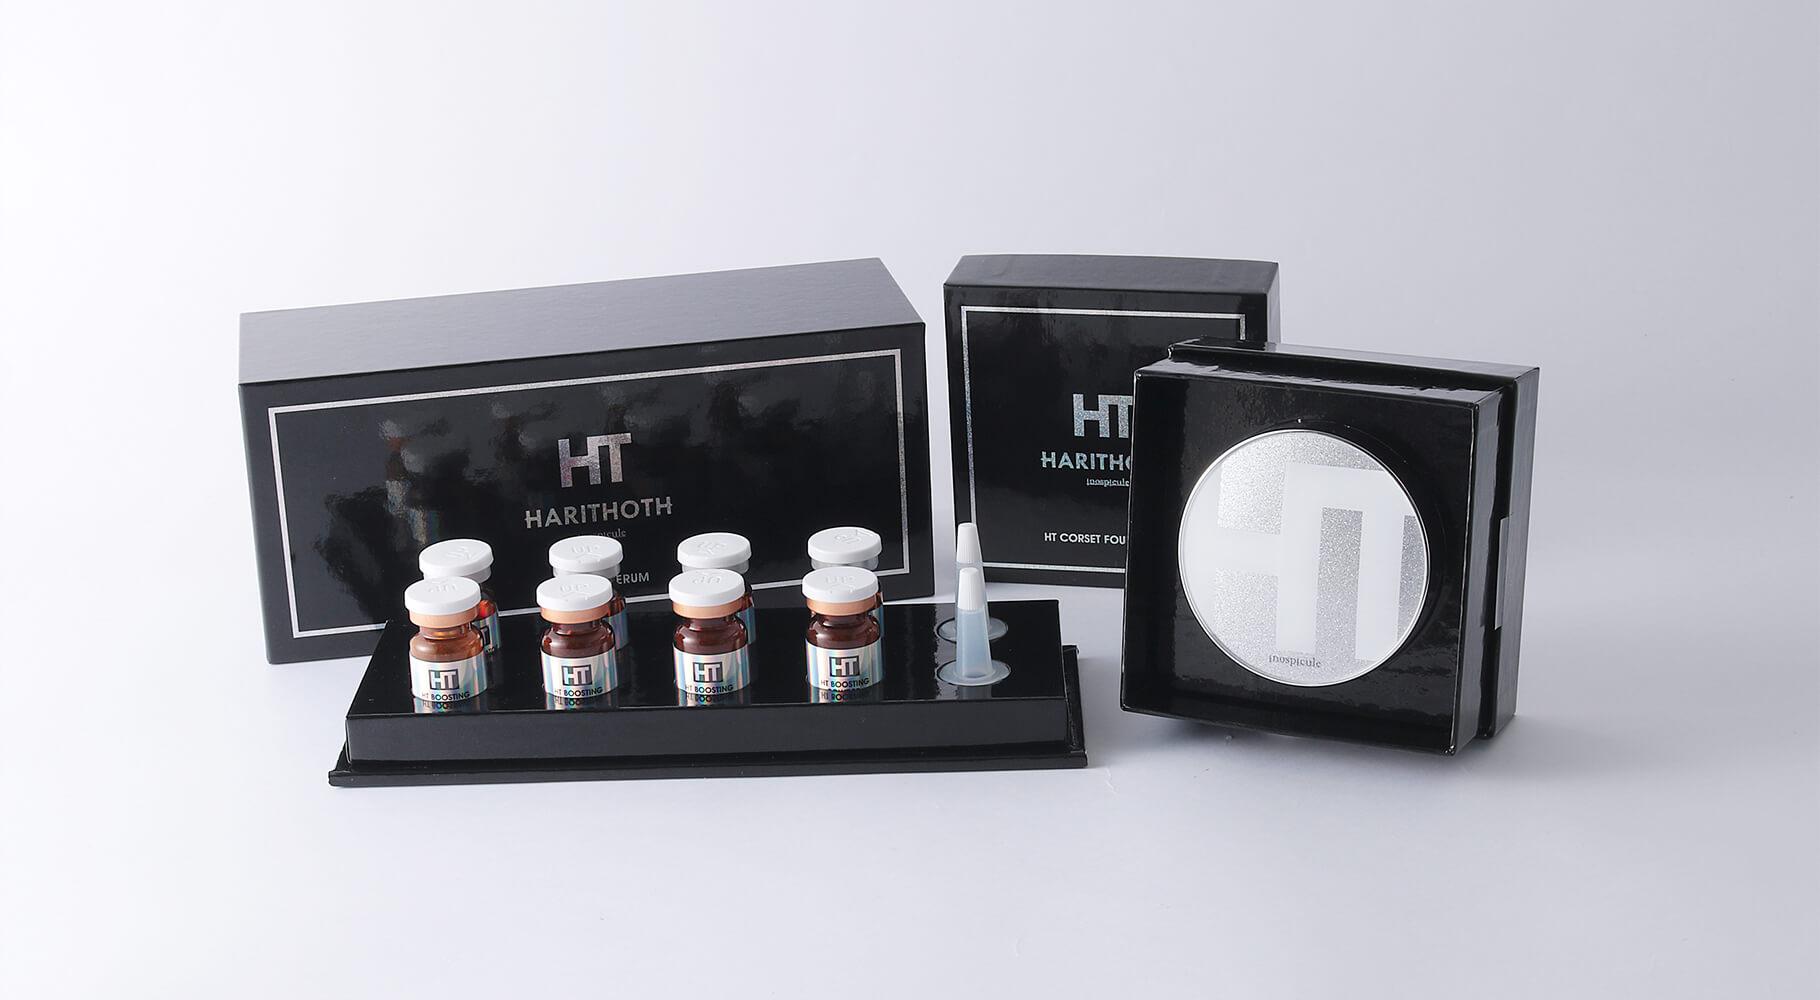 HARITHOTH Line up